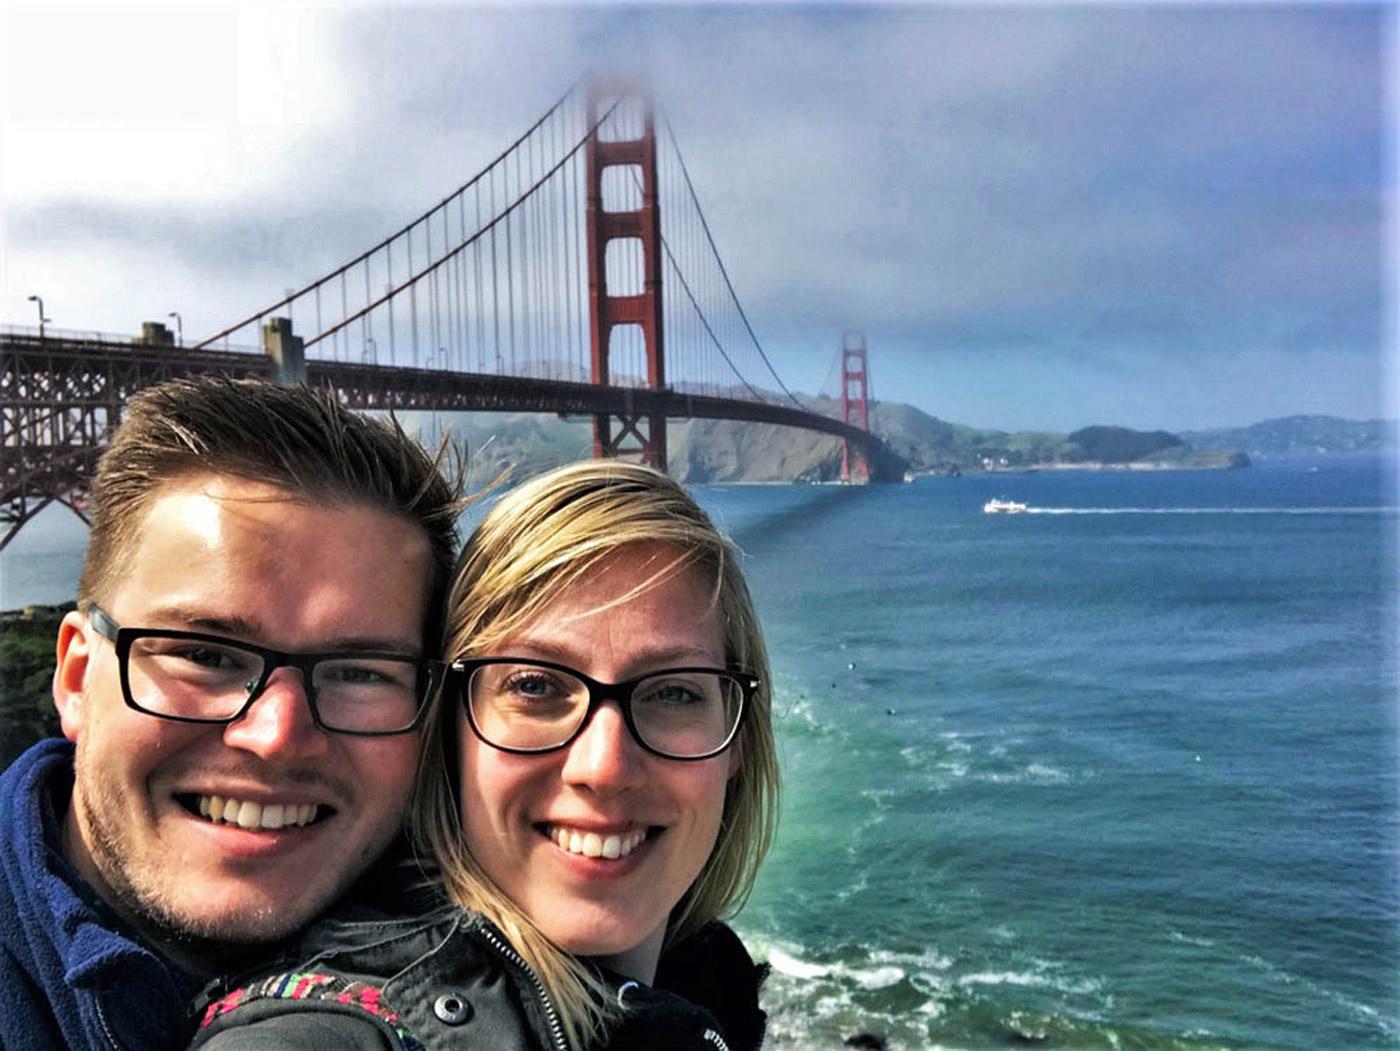 Karin: San Francisco Eindpunt rondreis